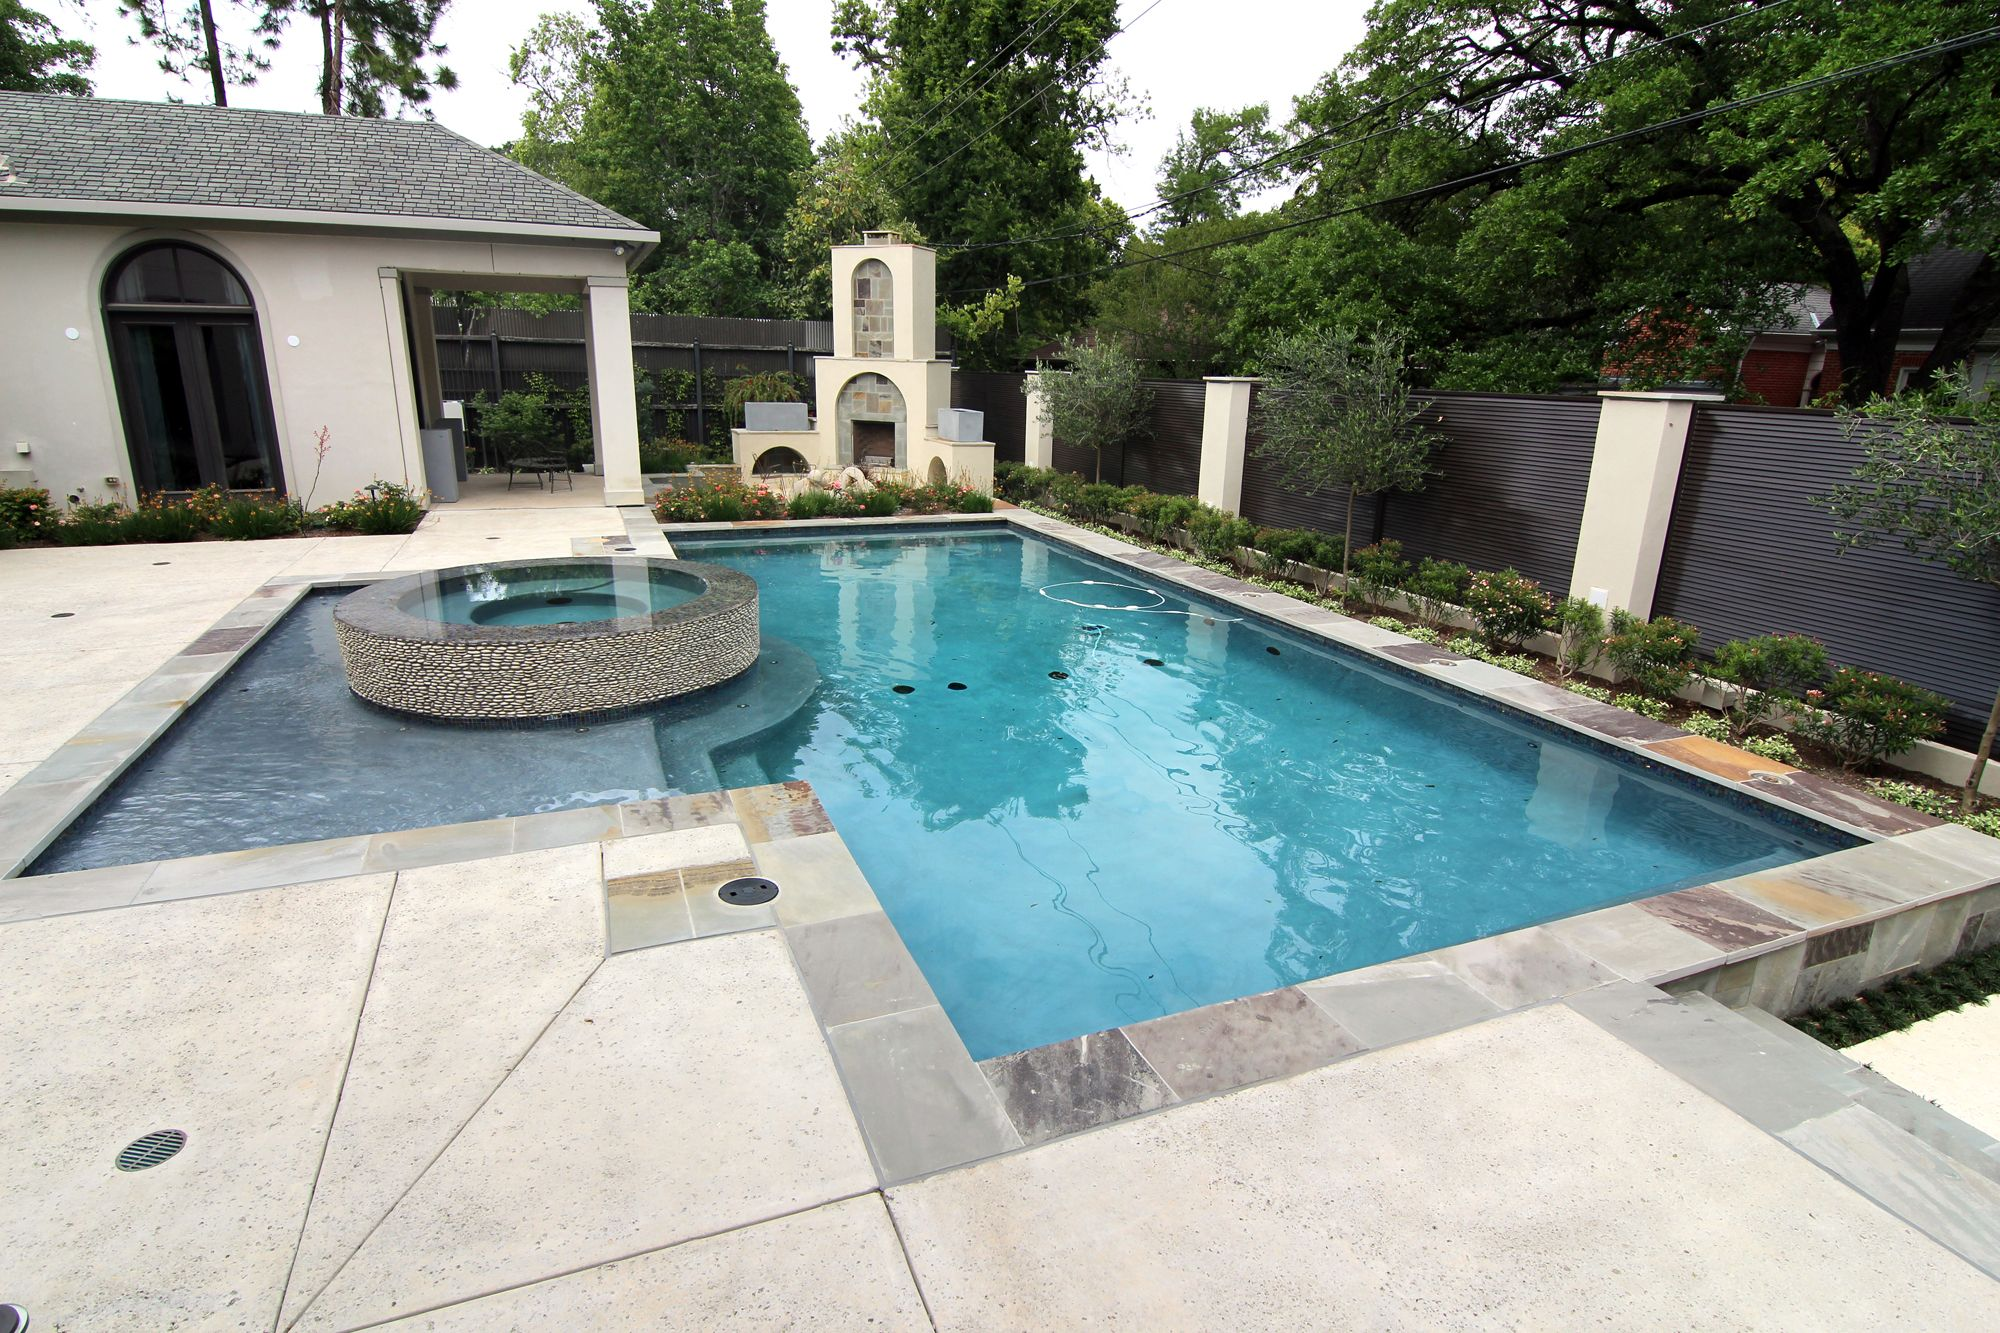 Pool Raised Beam With Fountain Swimming Pools Spa Pool Pool